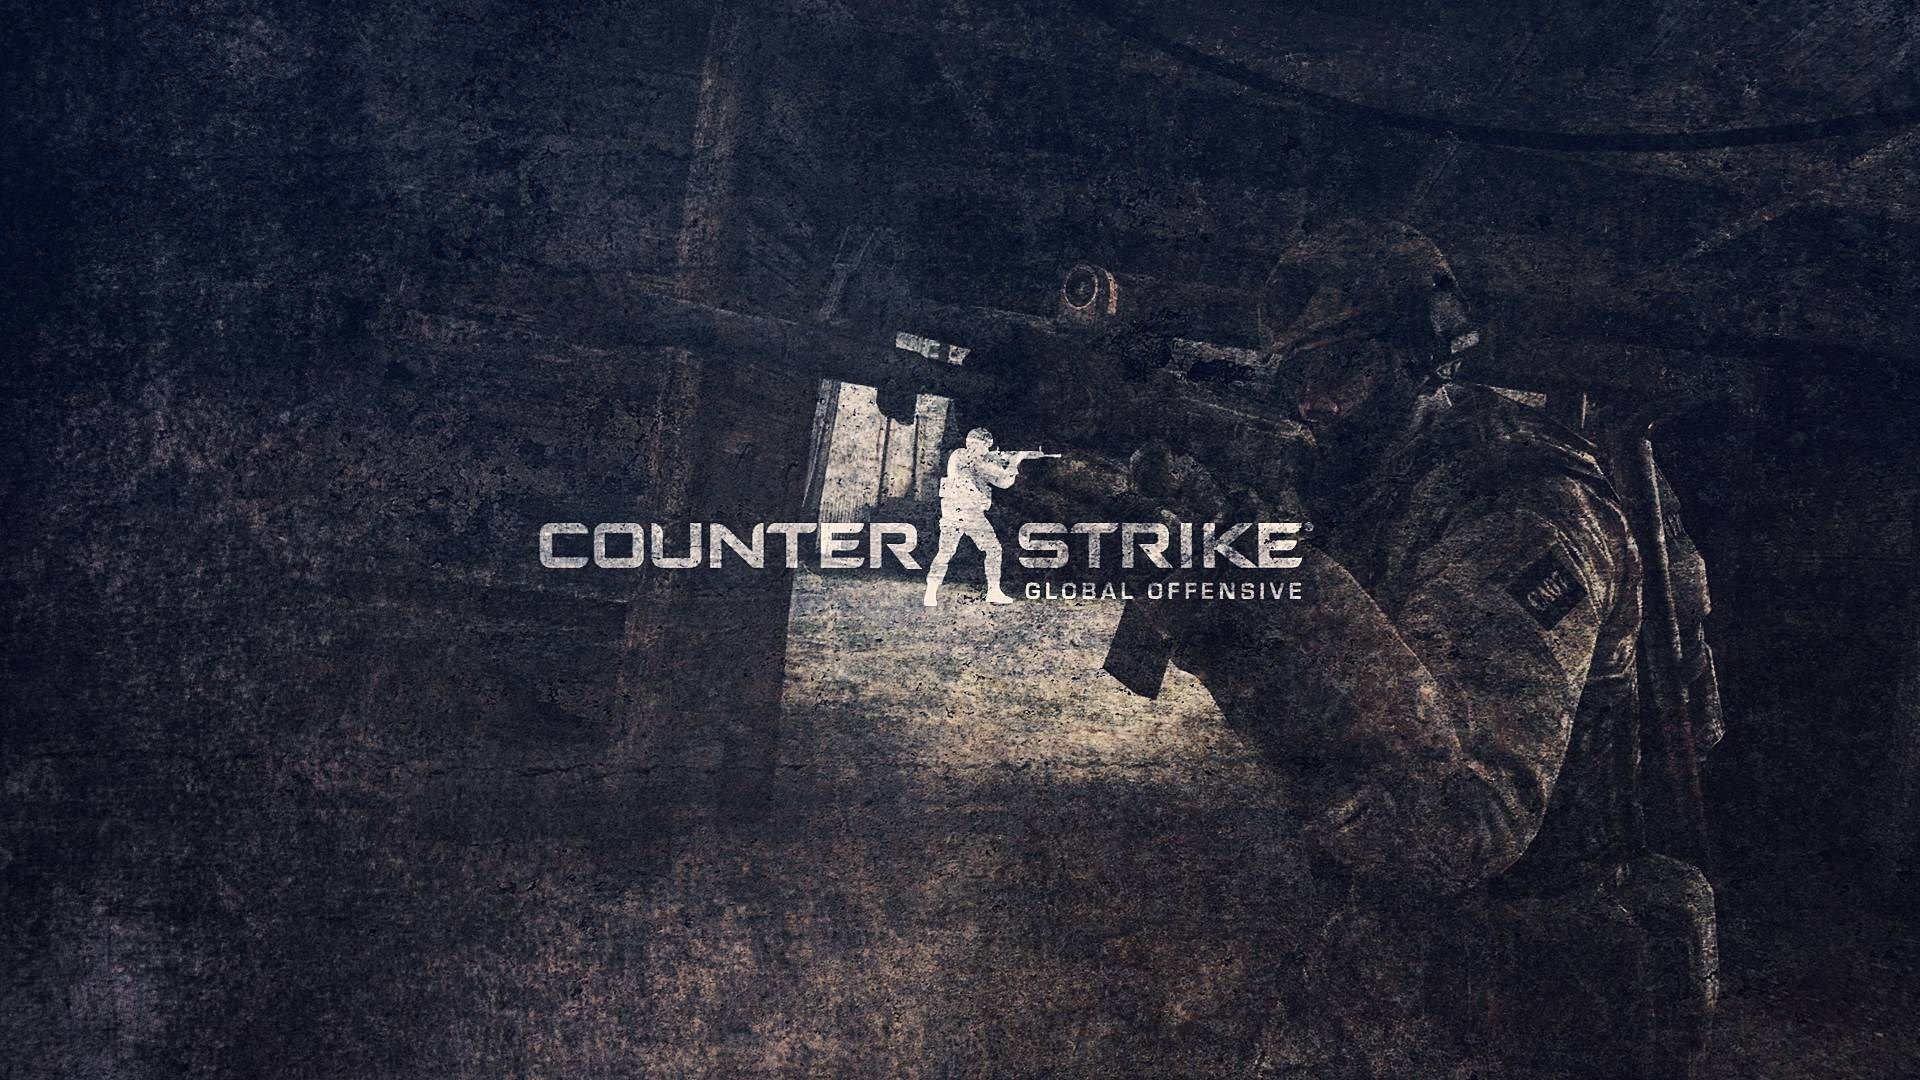 1920x1080 Hdq Images Counter Strike Global Offensive Go Wallpaper Go Logo Wallpaper Cs Go